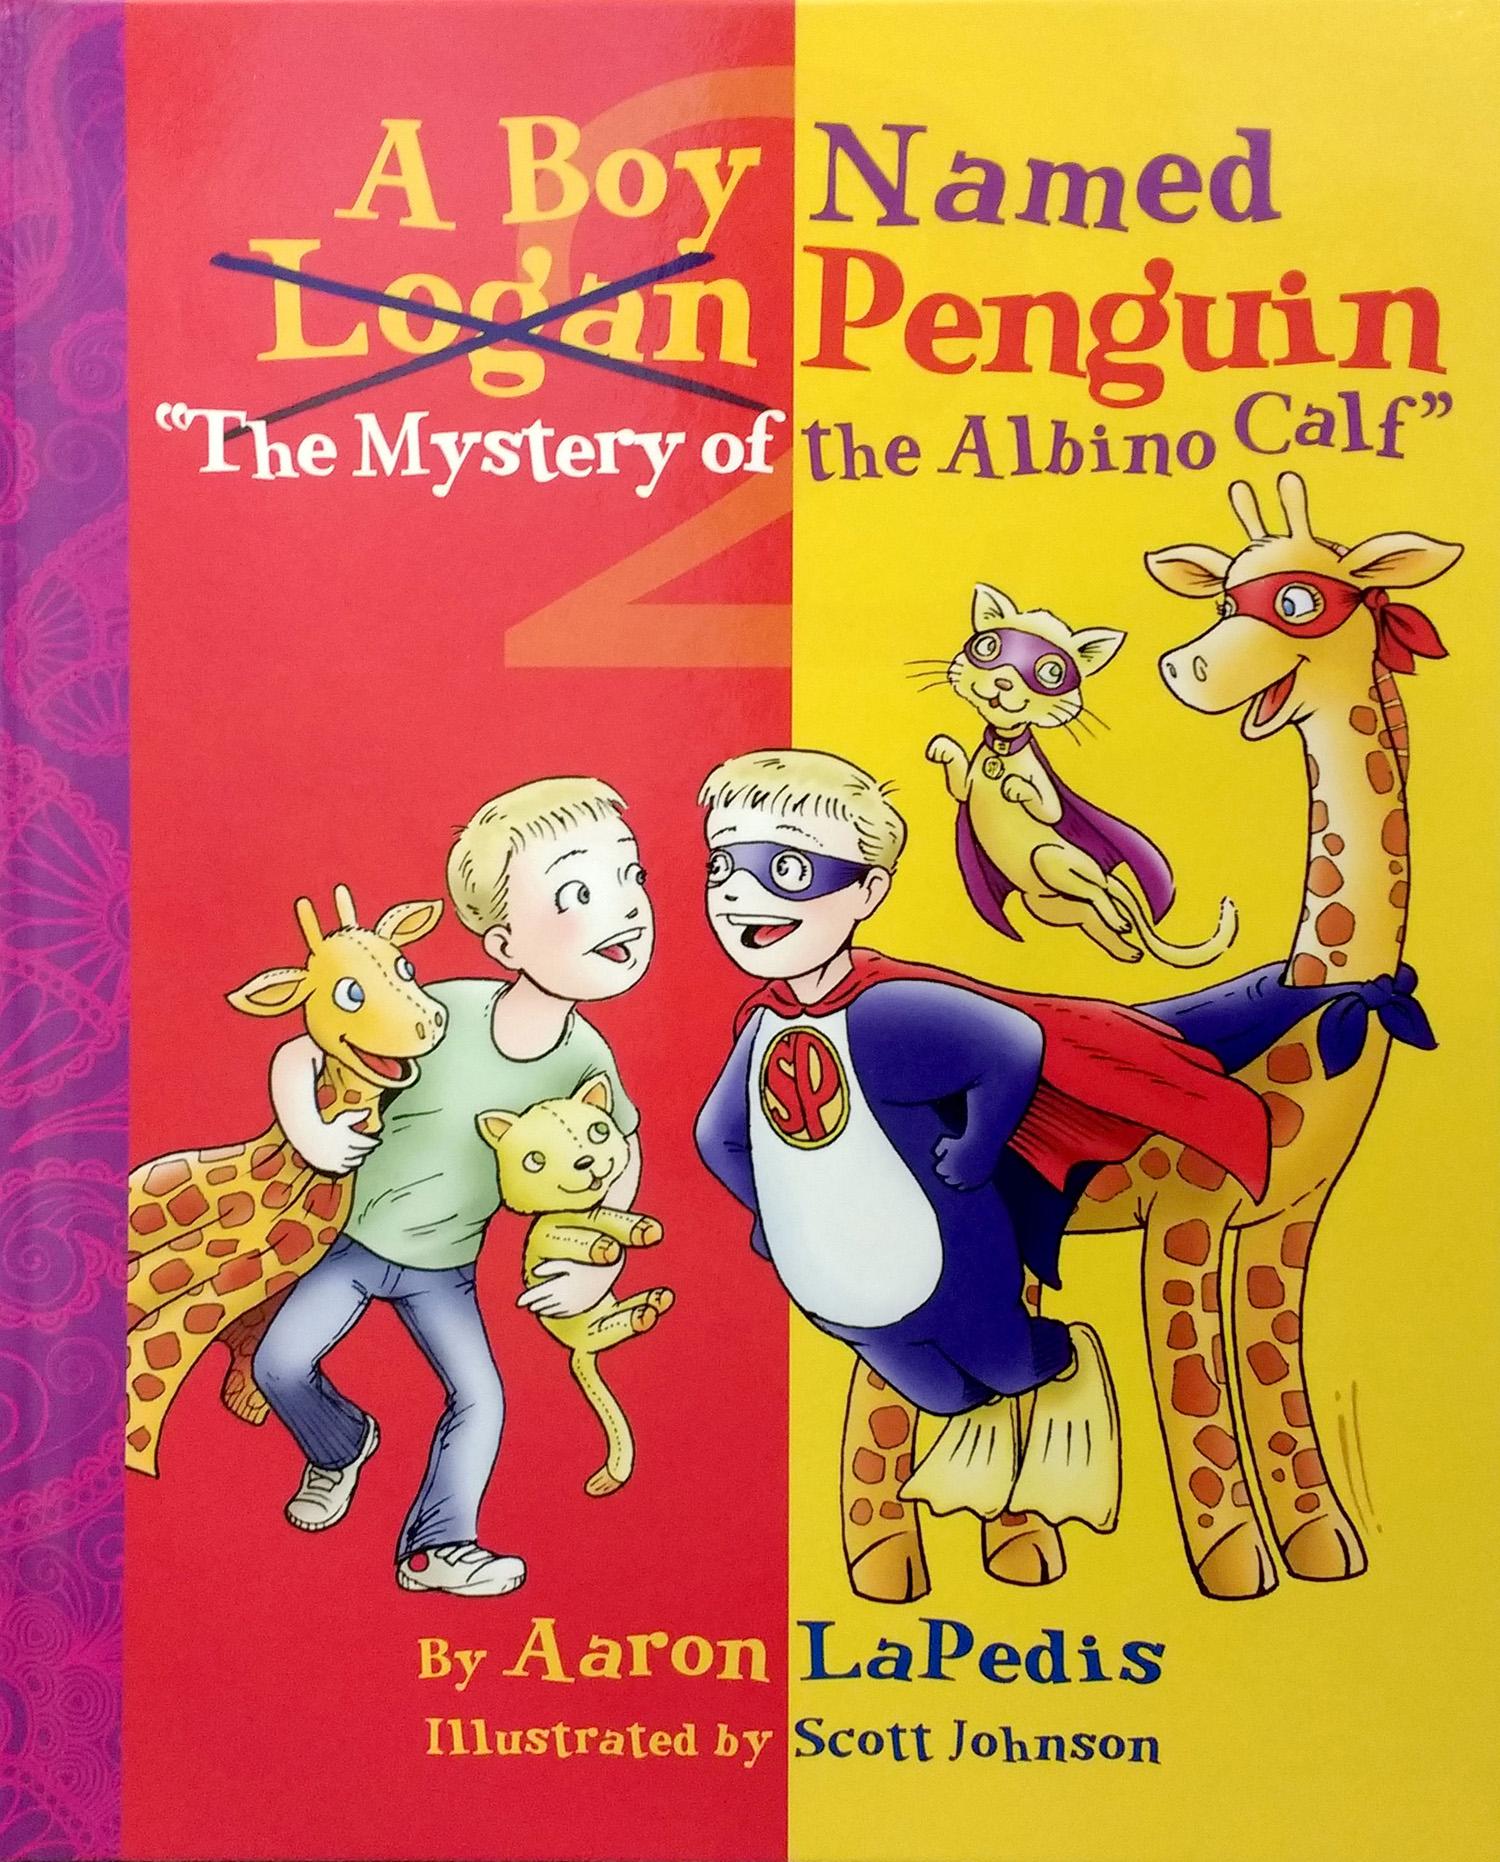 A Boy Named Penguin: The Mystery of the Albino Calf